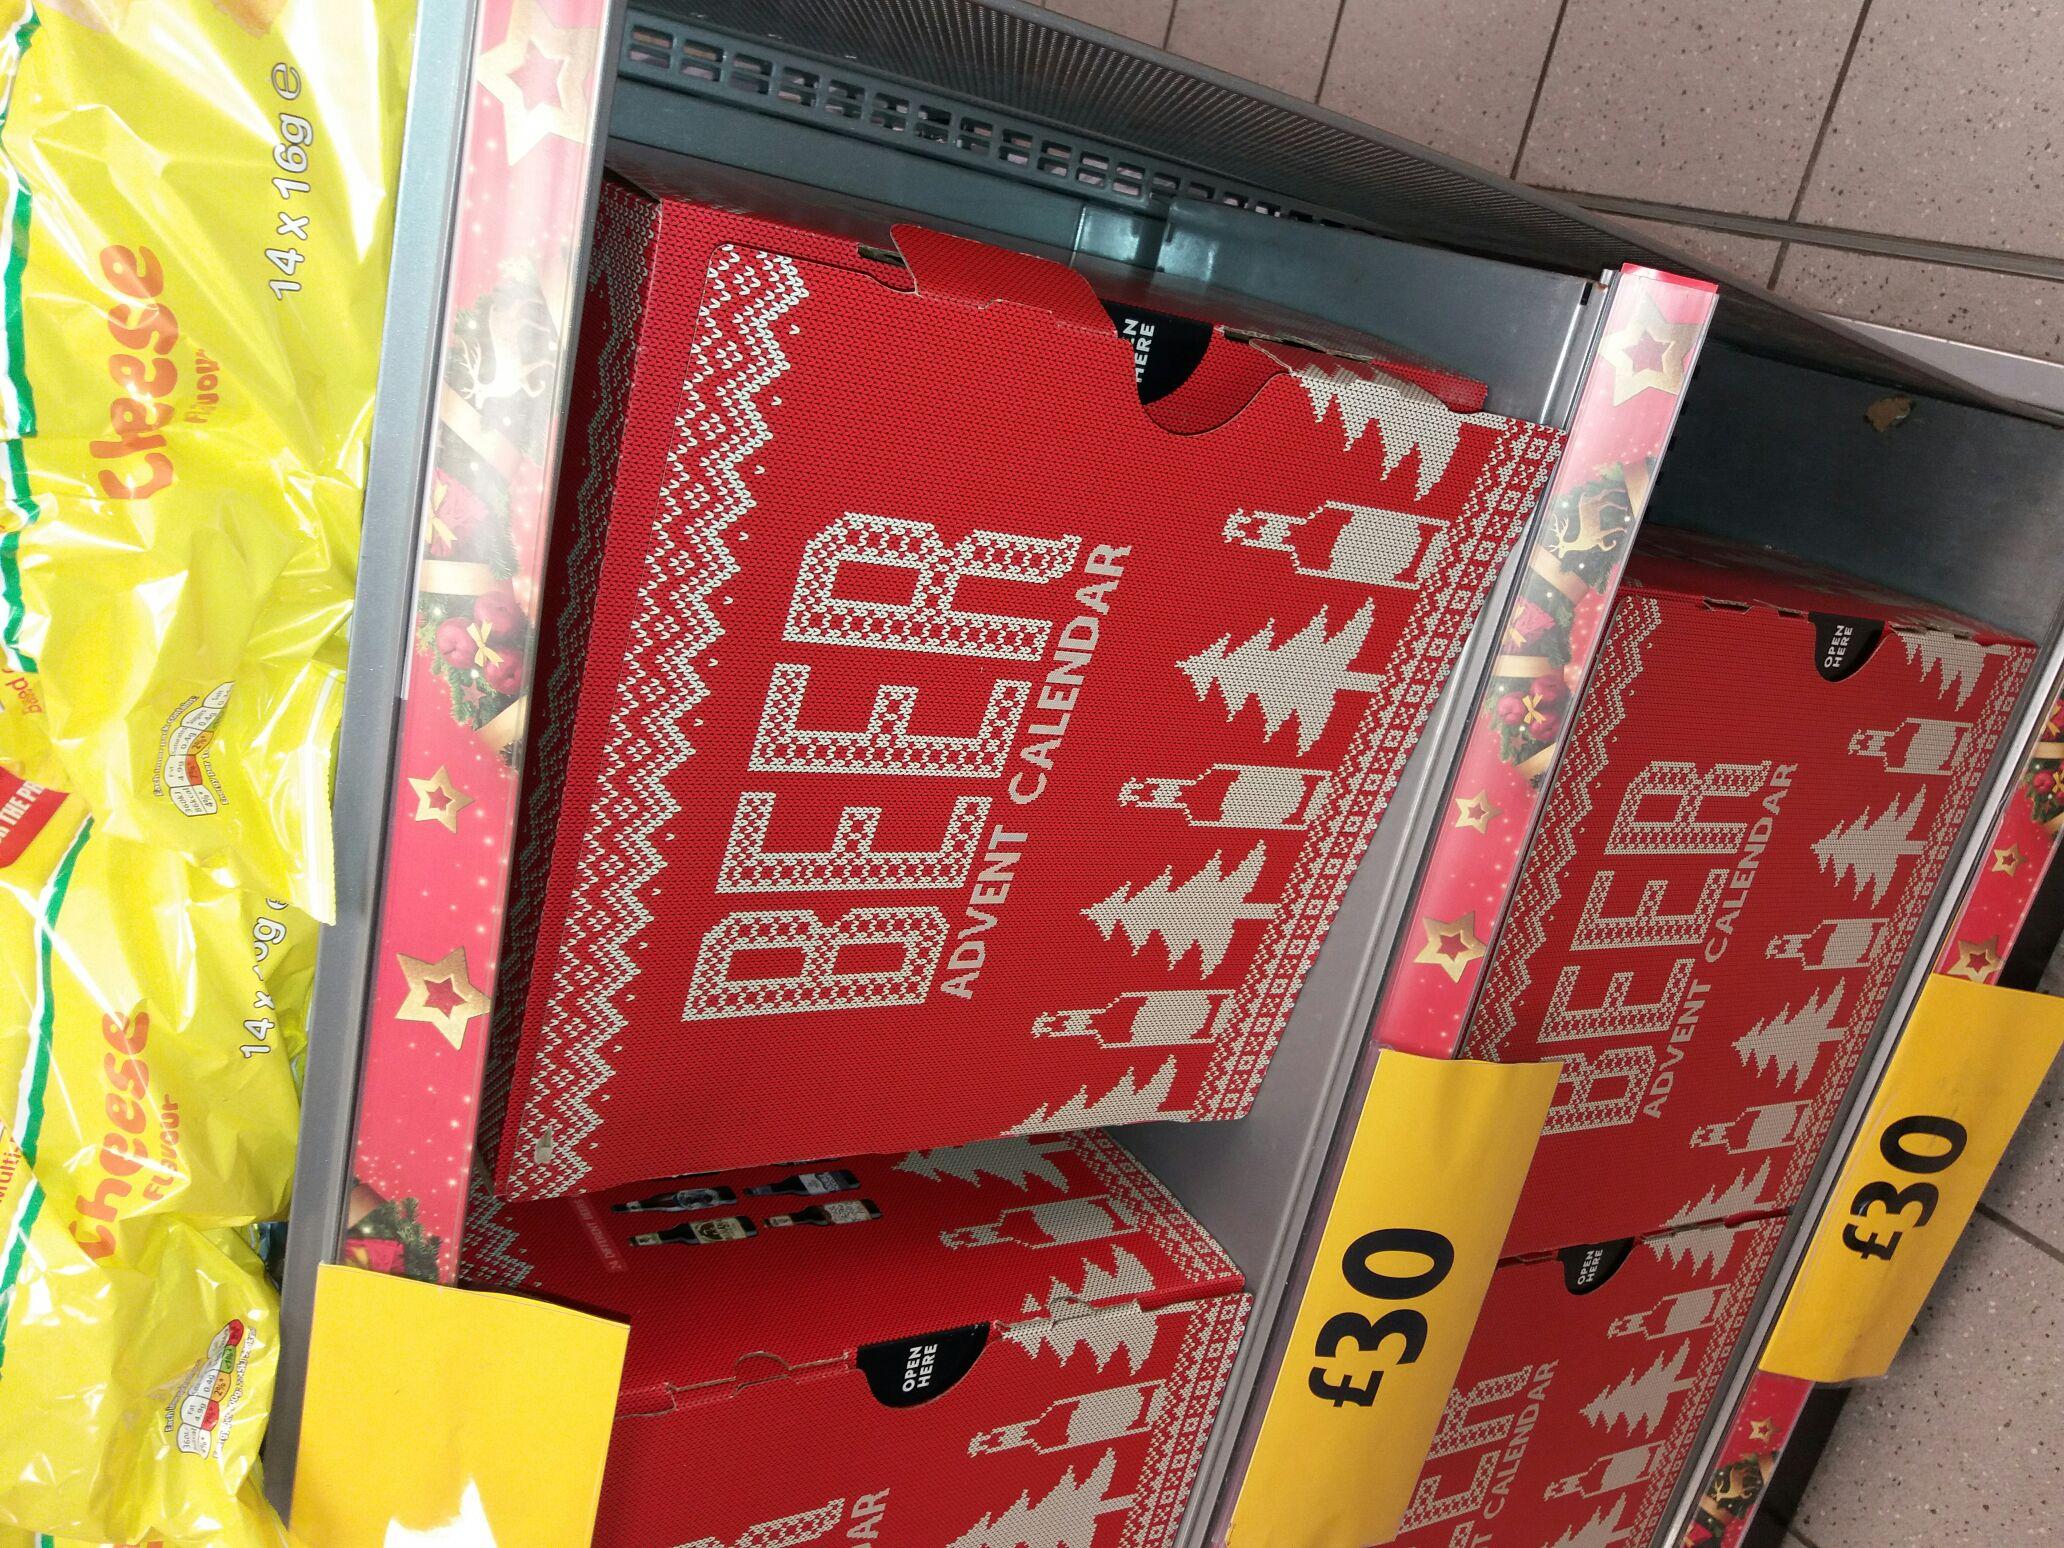 Beer advent calendar £30.00 instore @ Morrisons